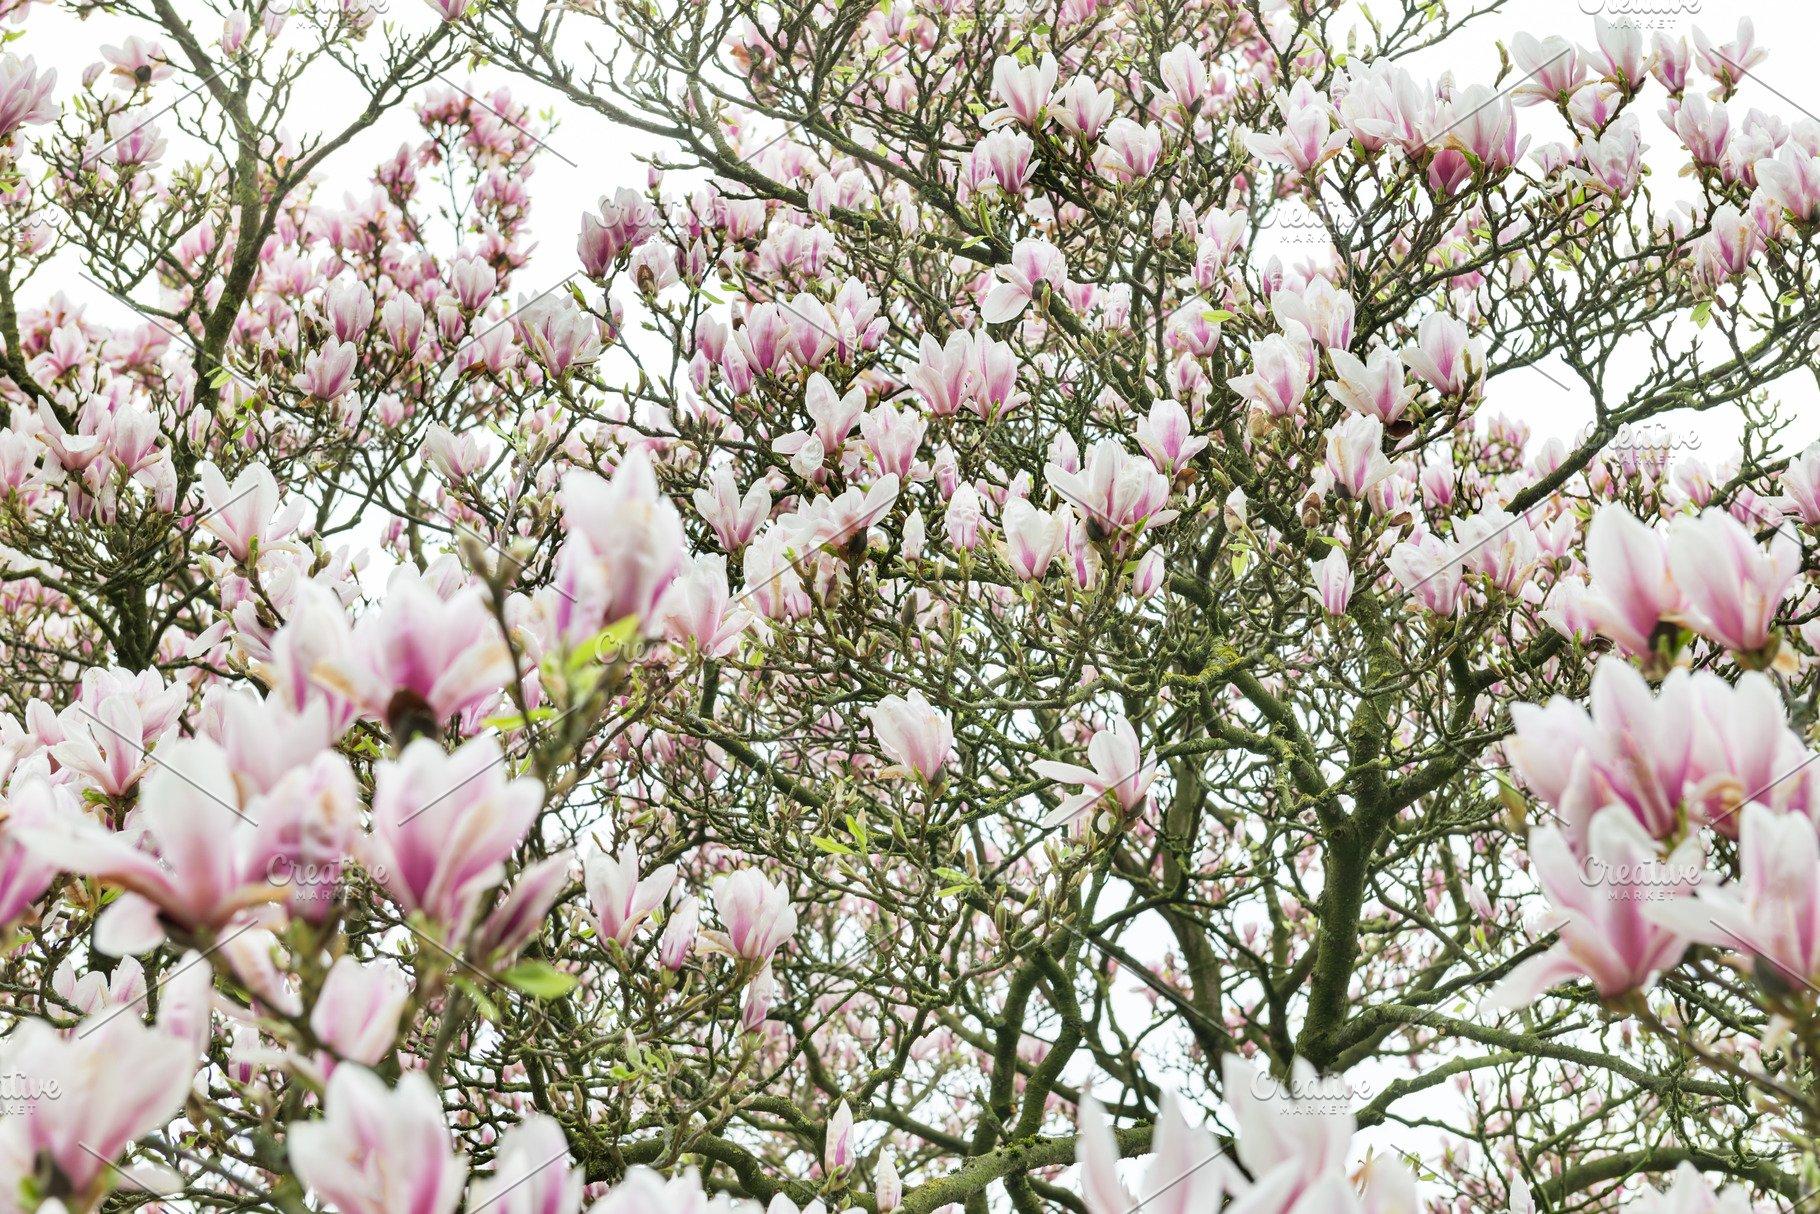 Pink Magnolia Tree With Blooming Flowers During Springtime In En